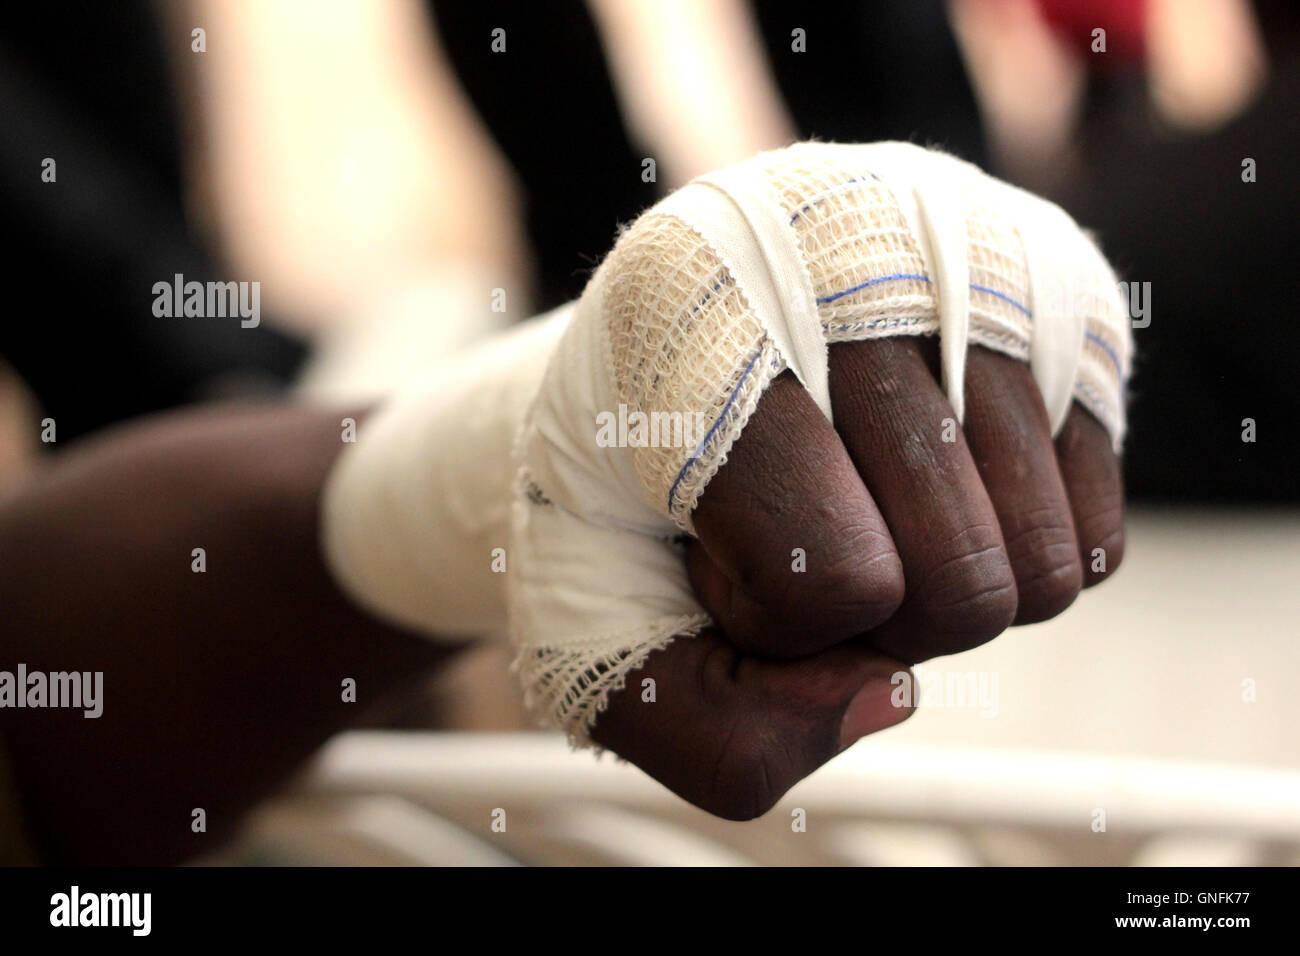 Kampala, Uganda. Aug. 31, 2016. Ugandan boxing coaches attentively following how to tie an Olympic boxing bandage - Stock Image